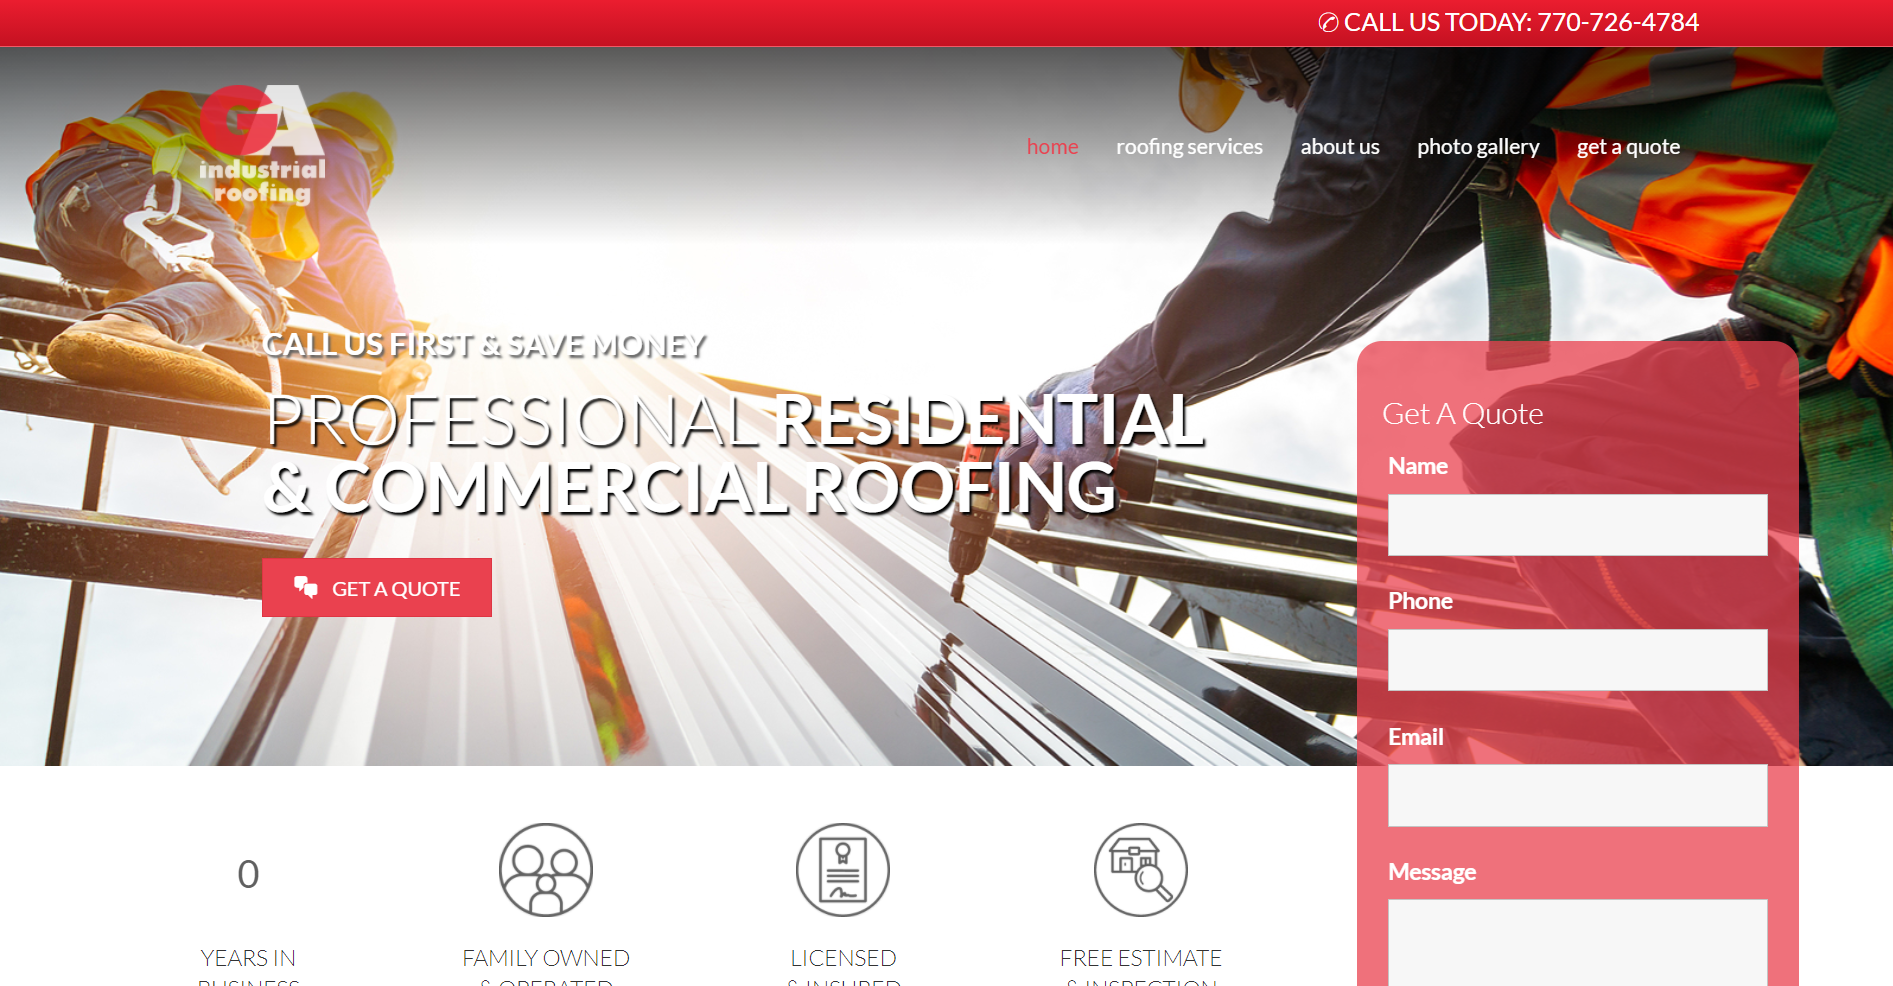 GA Industrial Roofing